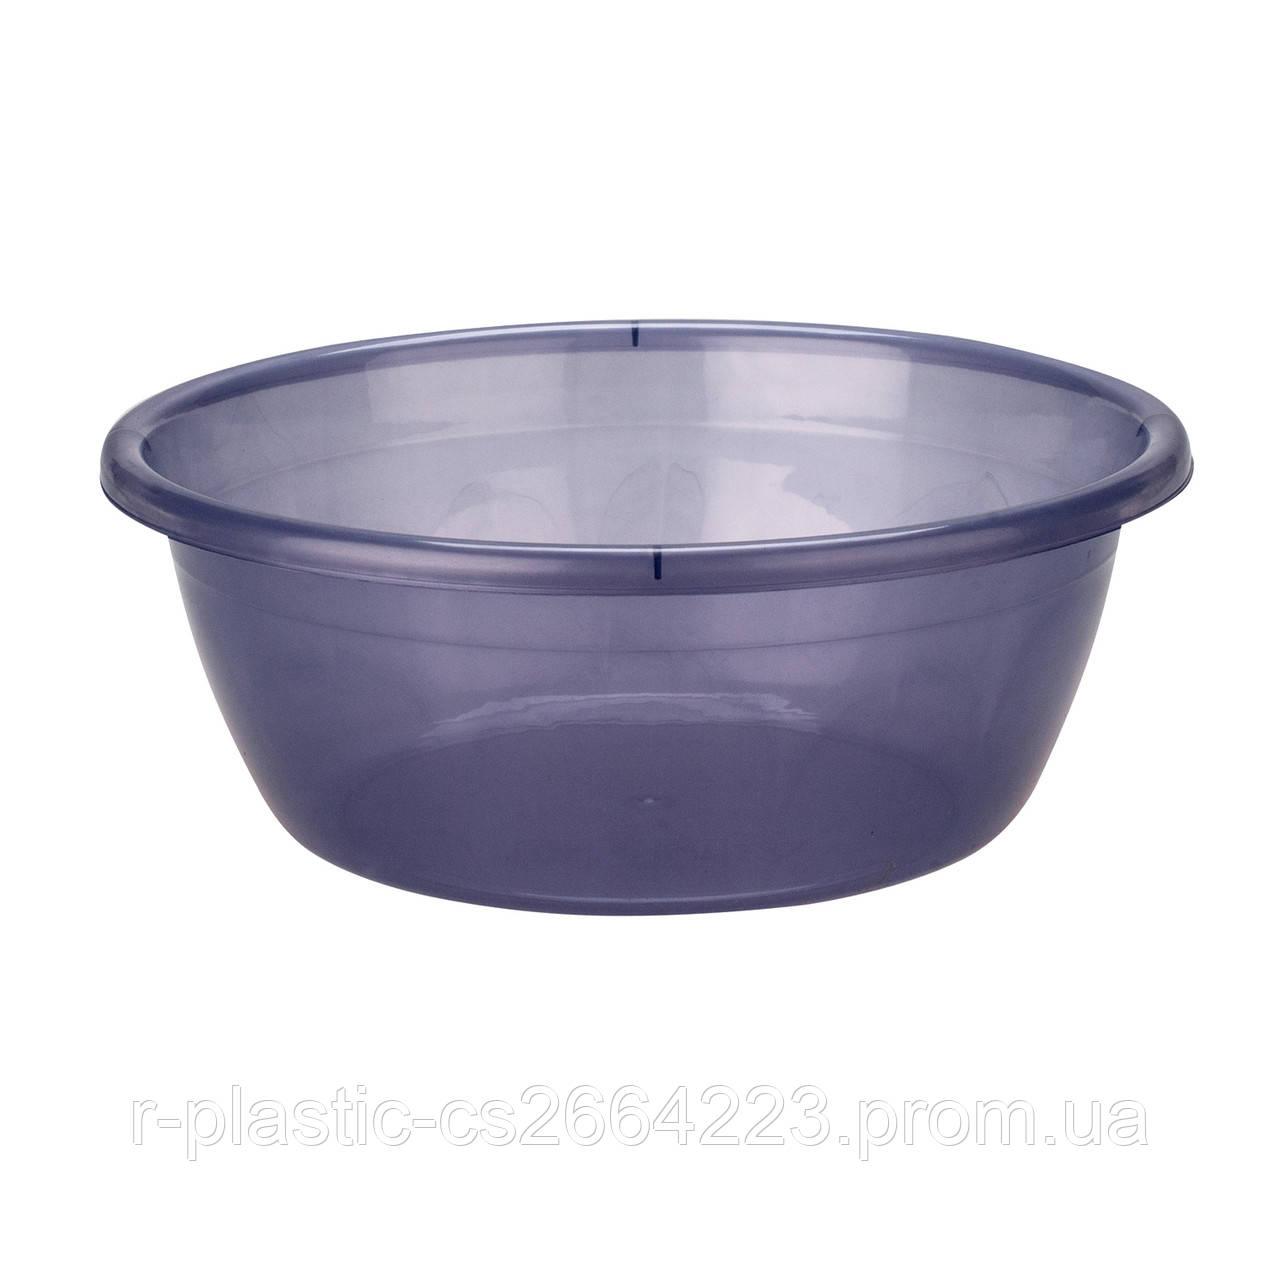 Миска R-Plastic прозрачная 4,5л фиолетовая